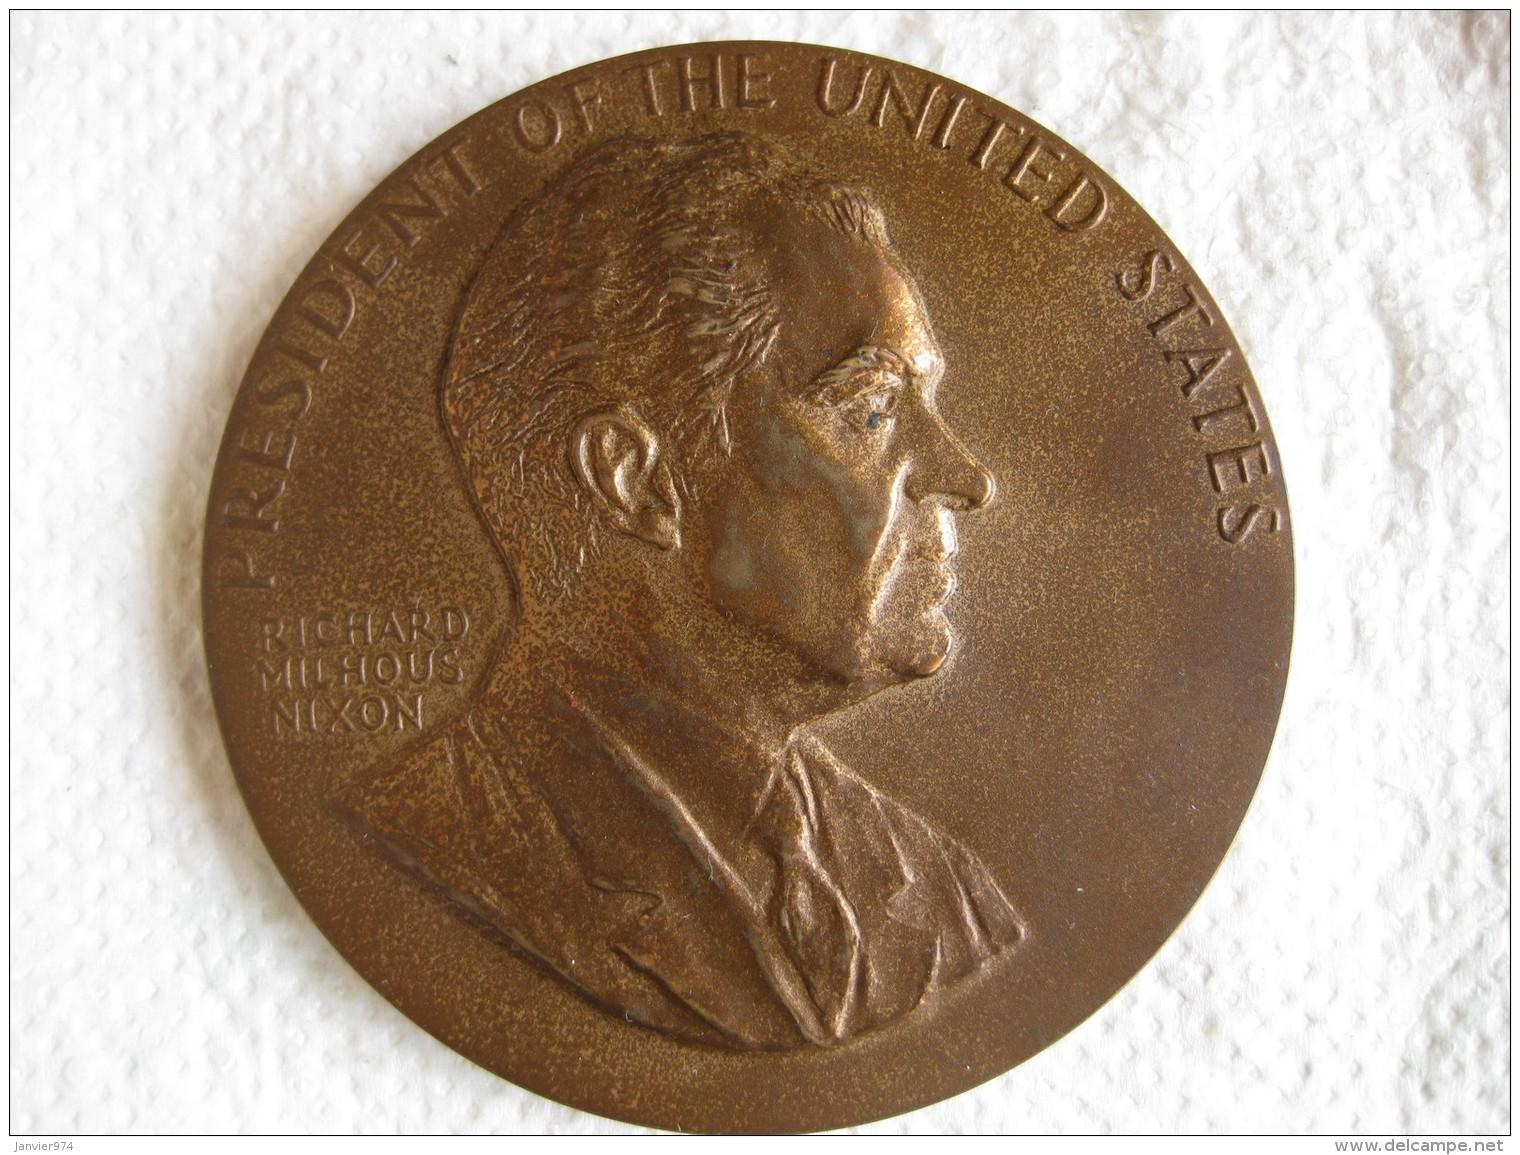 Médaille Richard Nixon President Of The United States 1969, Par Gasparro - USA